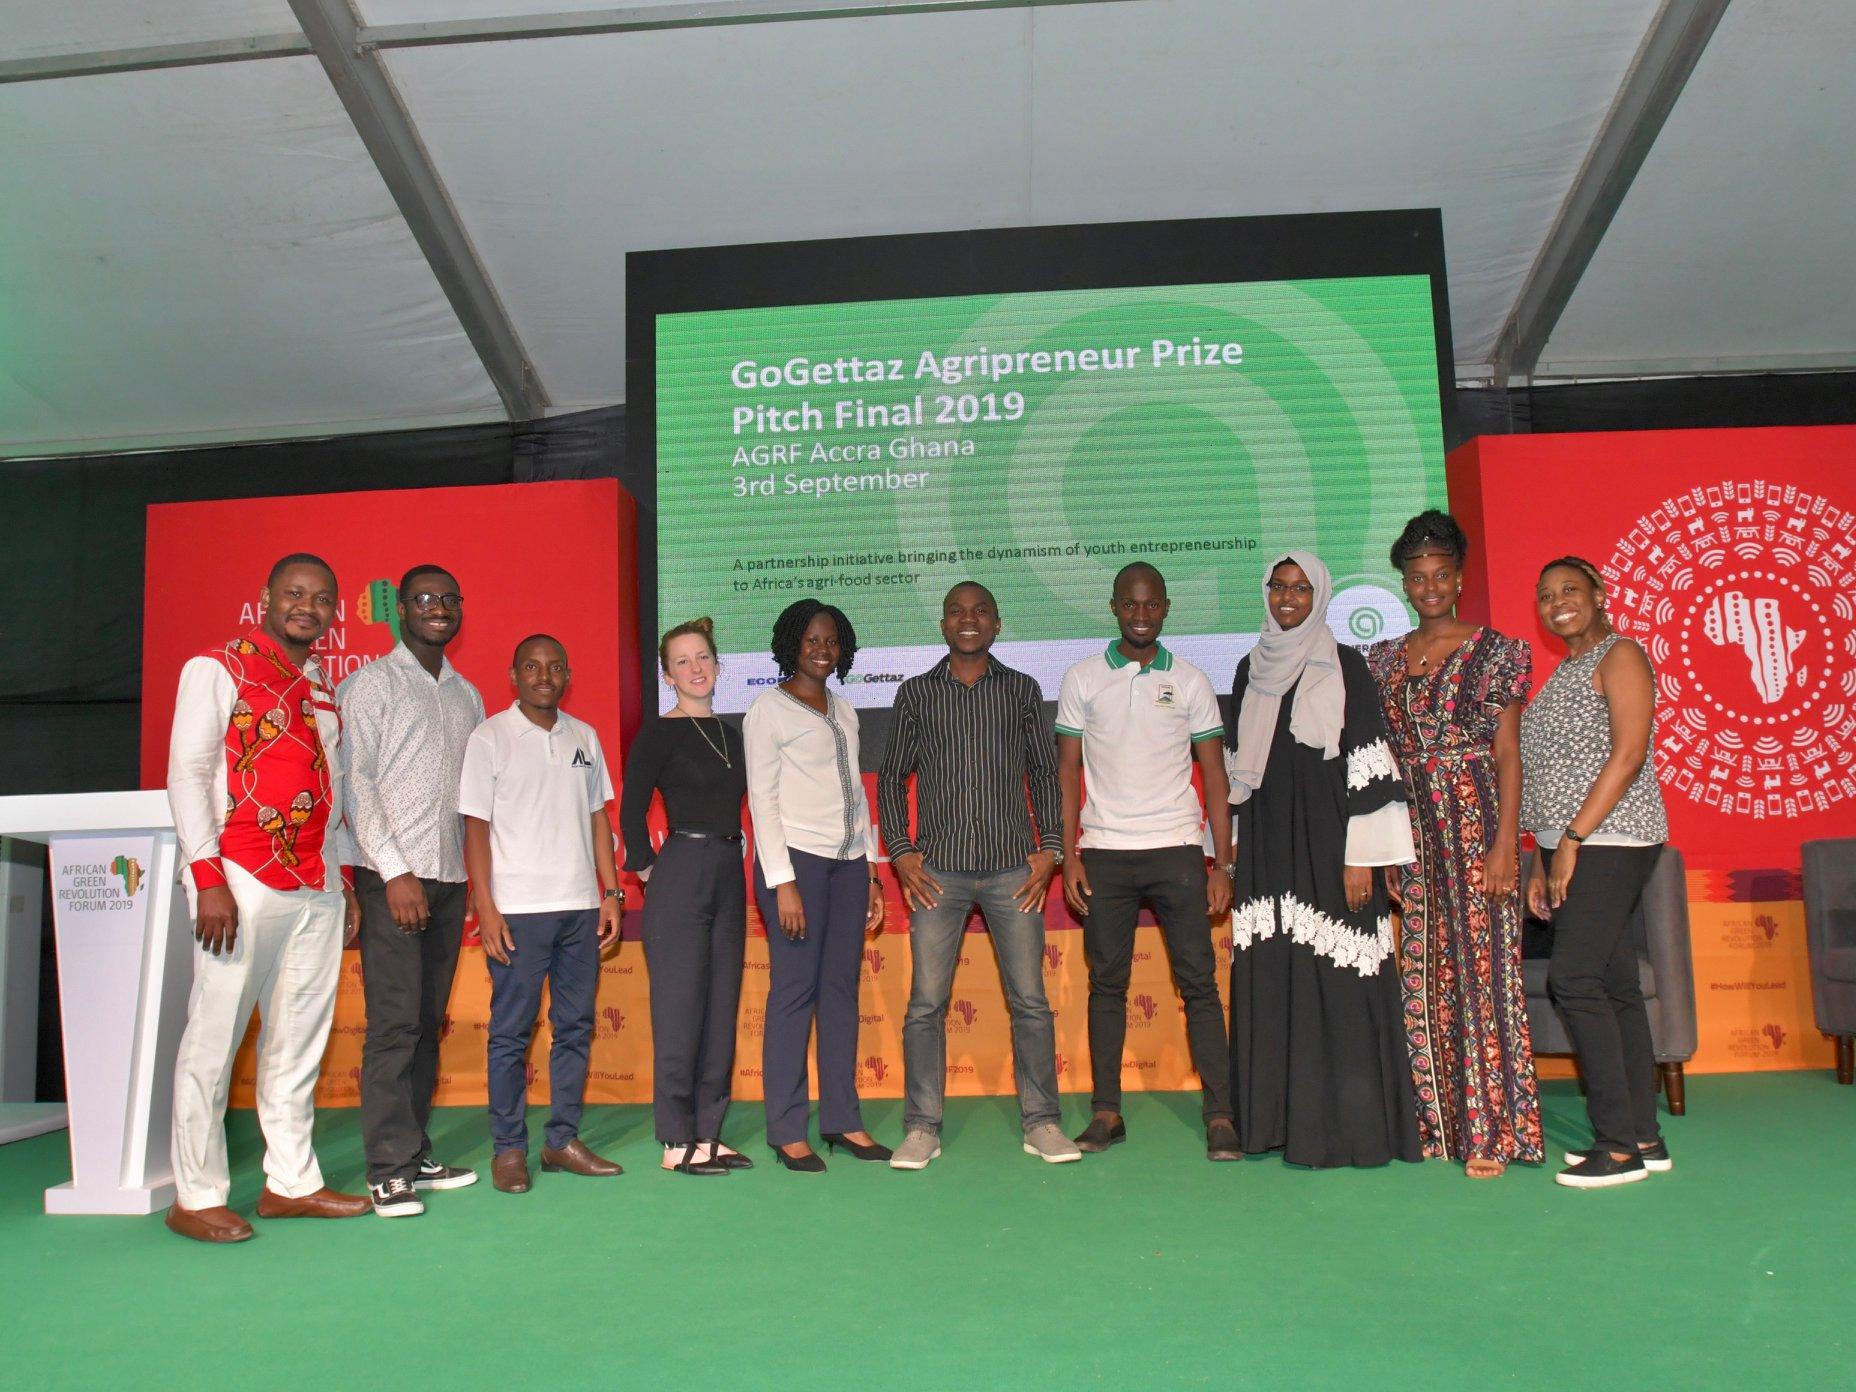 Press Release: 12 Young Entrepreneurs Vie To Win Prestigious $100,000 GoGettaz Agripreneur Prize - Generation Africa